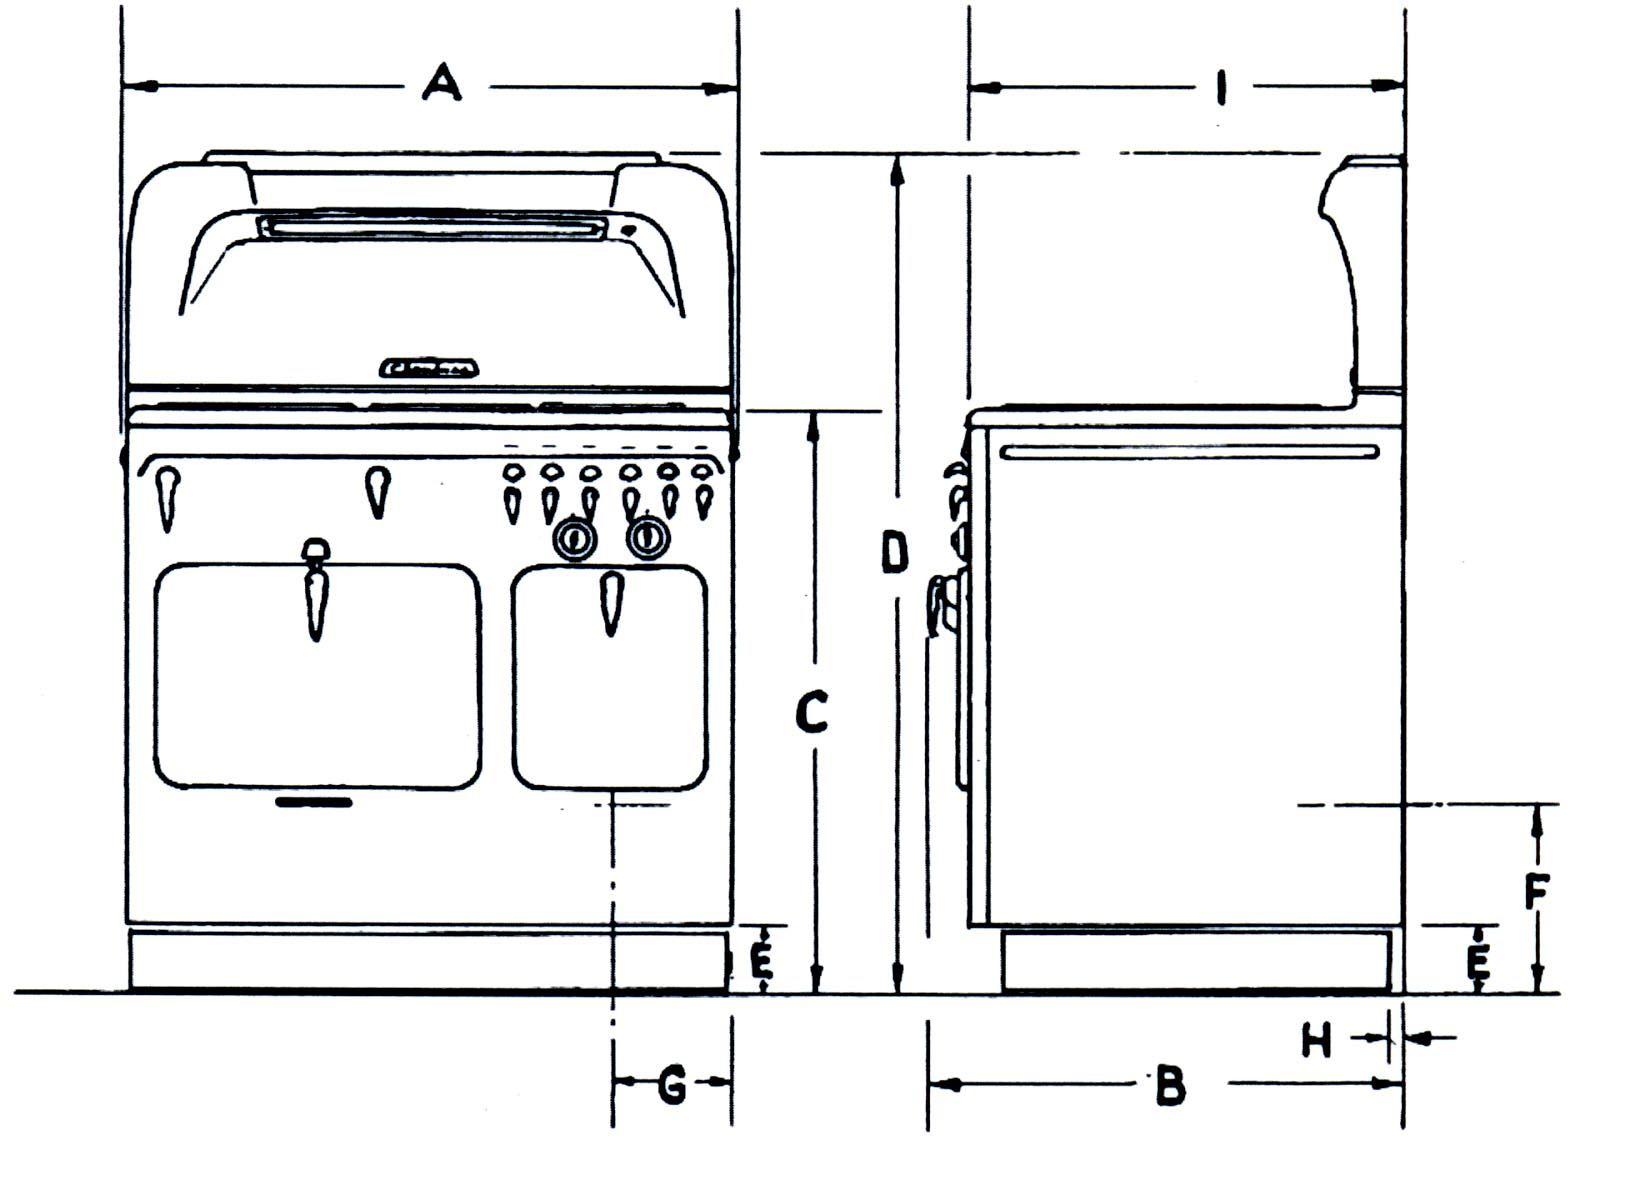 Measurements For Chambers Range